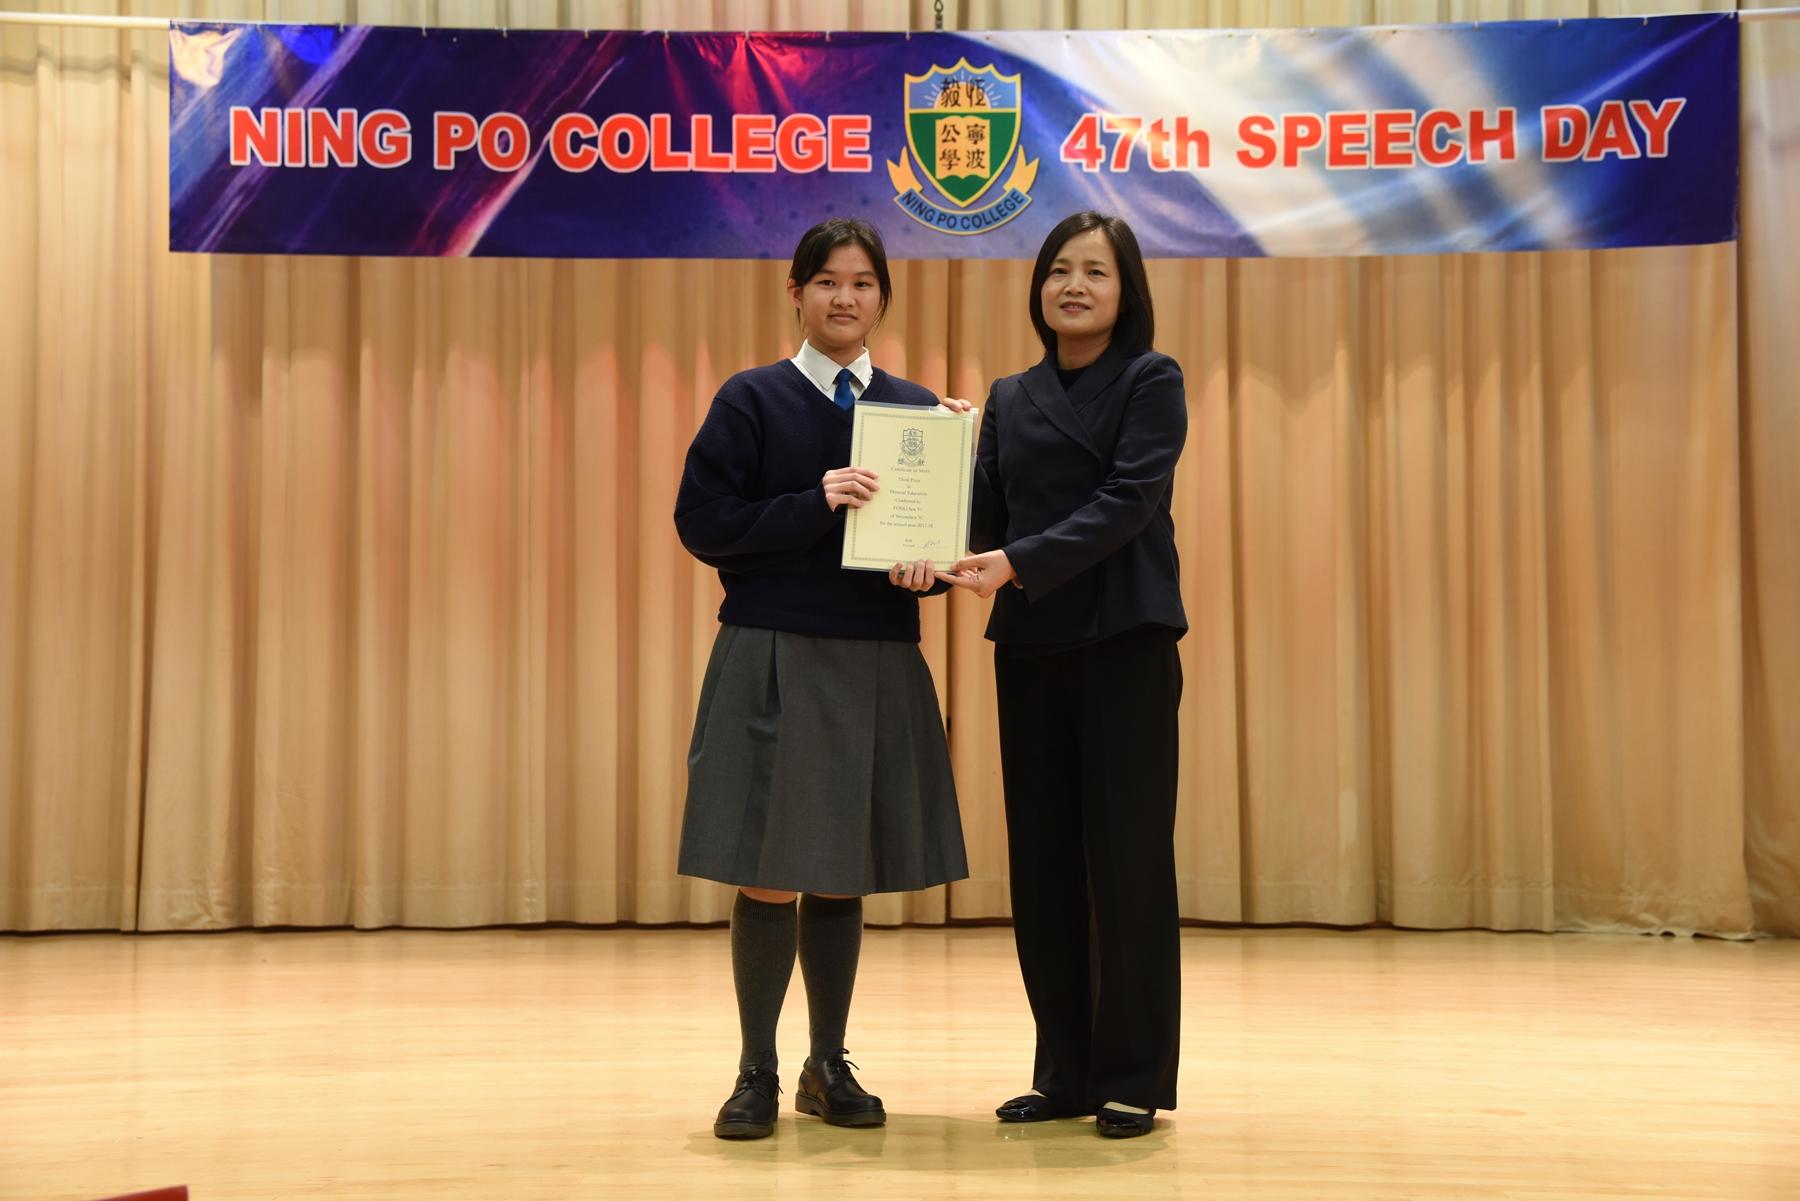 http://npc.edu.hk/sites/default/files/dsc_8650_1.jpg